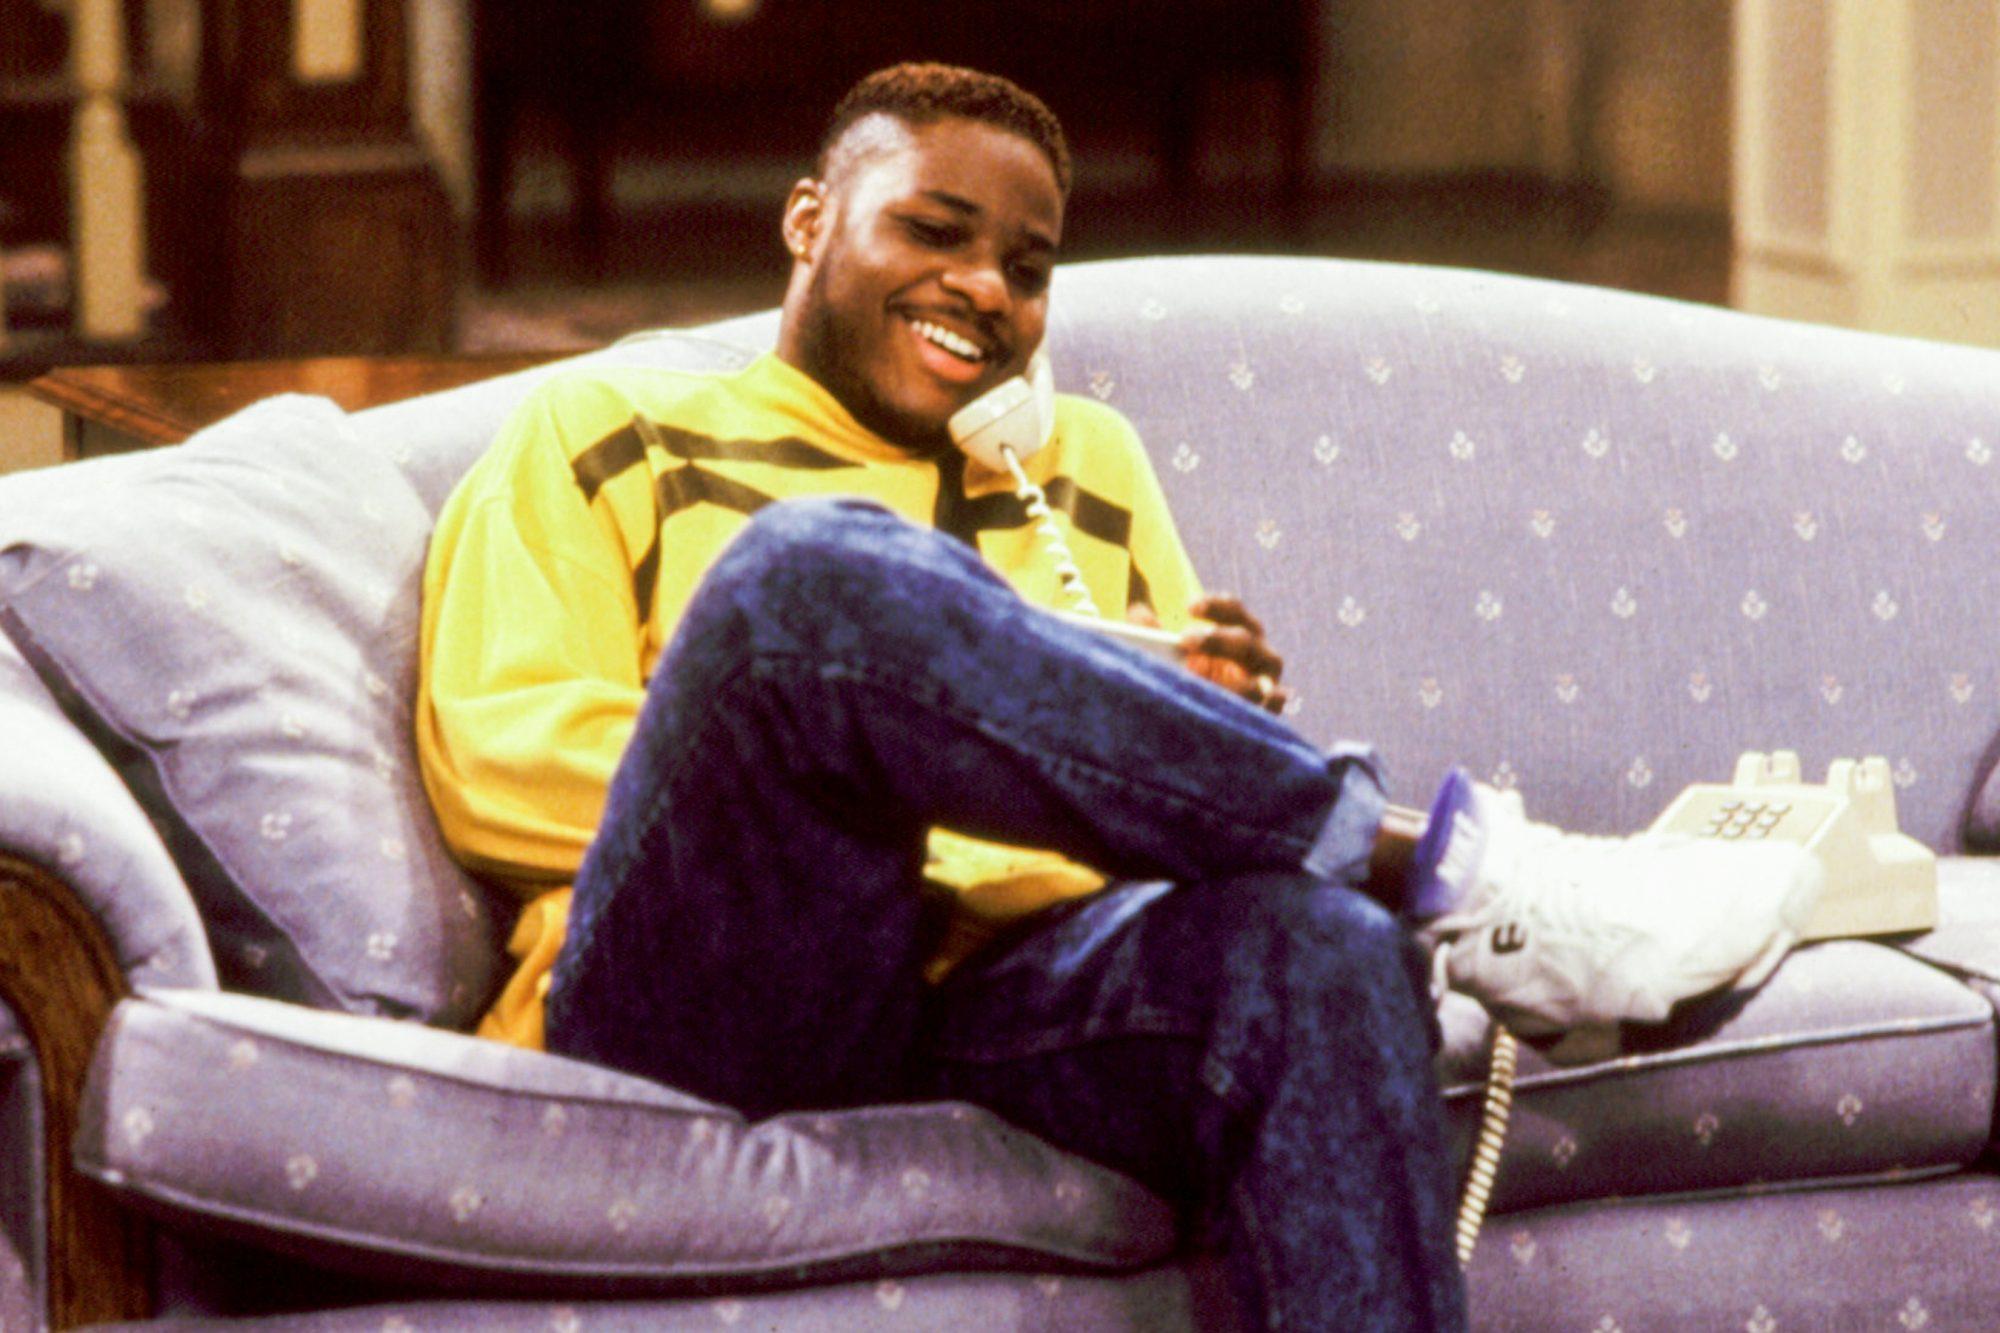 COSBY SHOW, Malcolm-Jamal Warner, 1984-1992, telephone